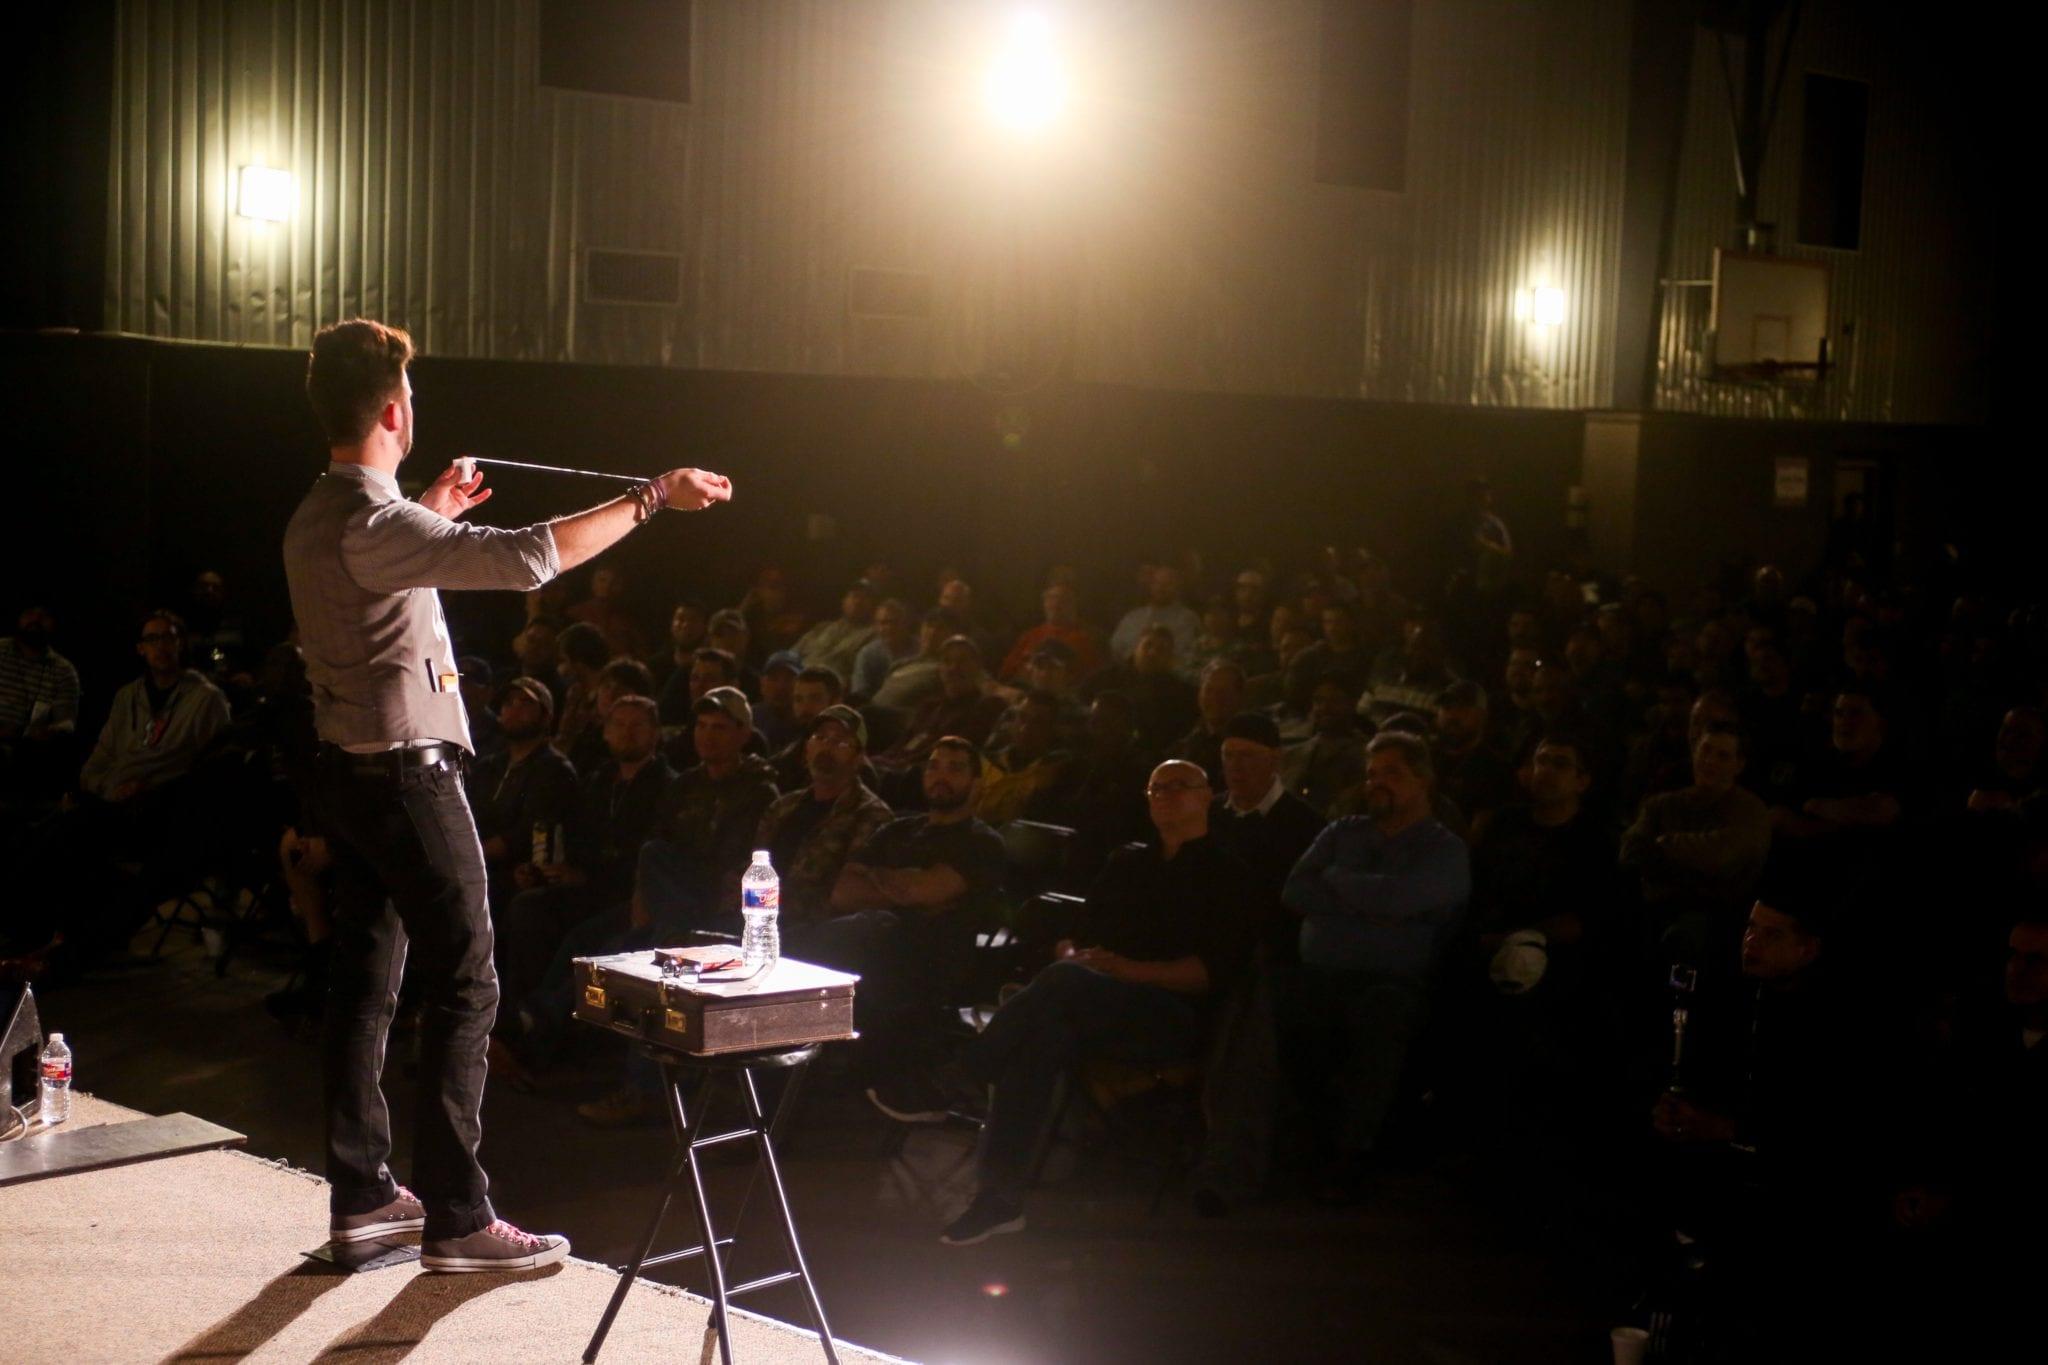 College Magician Grant Price Performing MENTAL